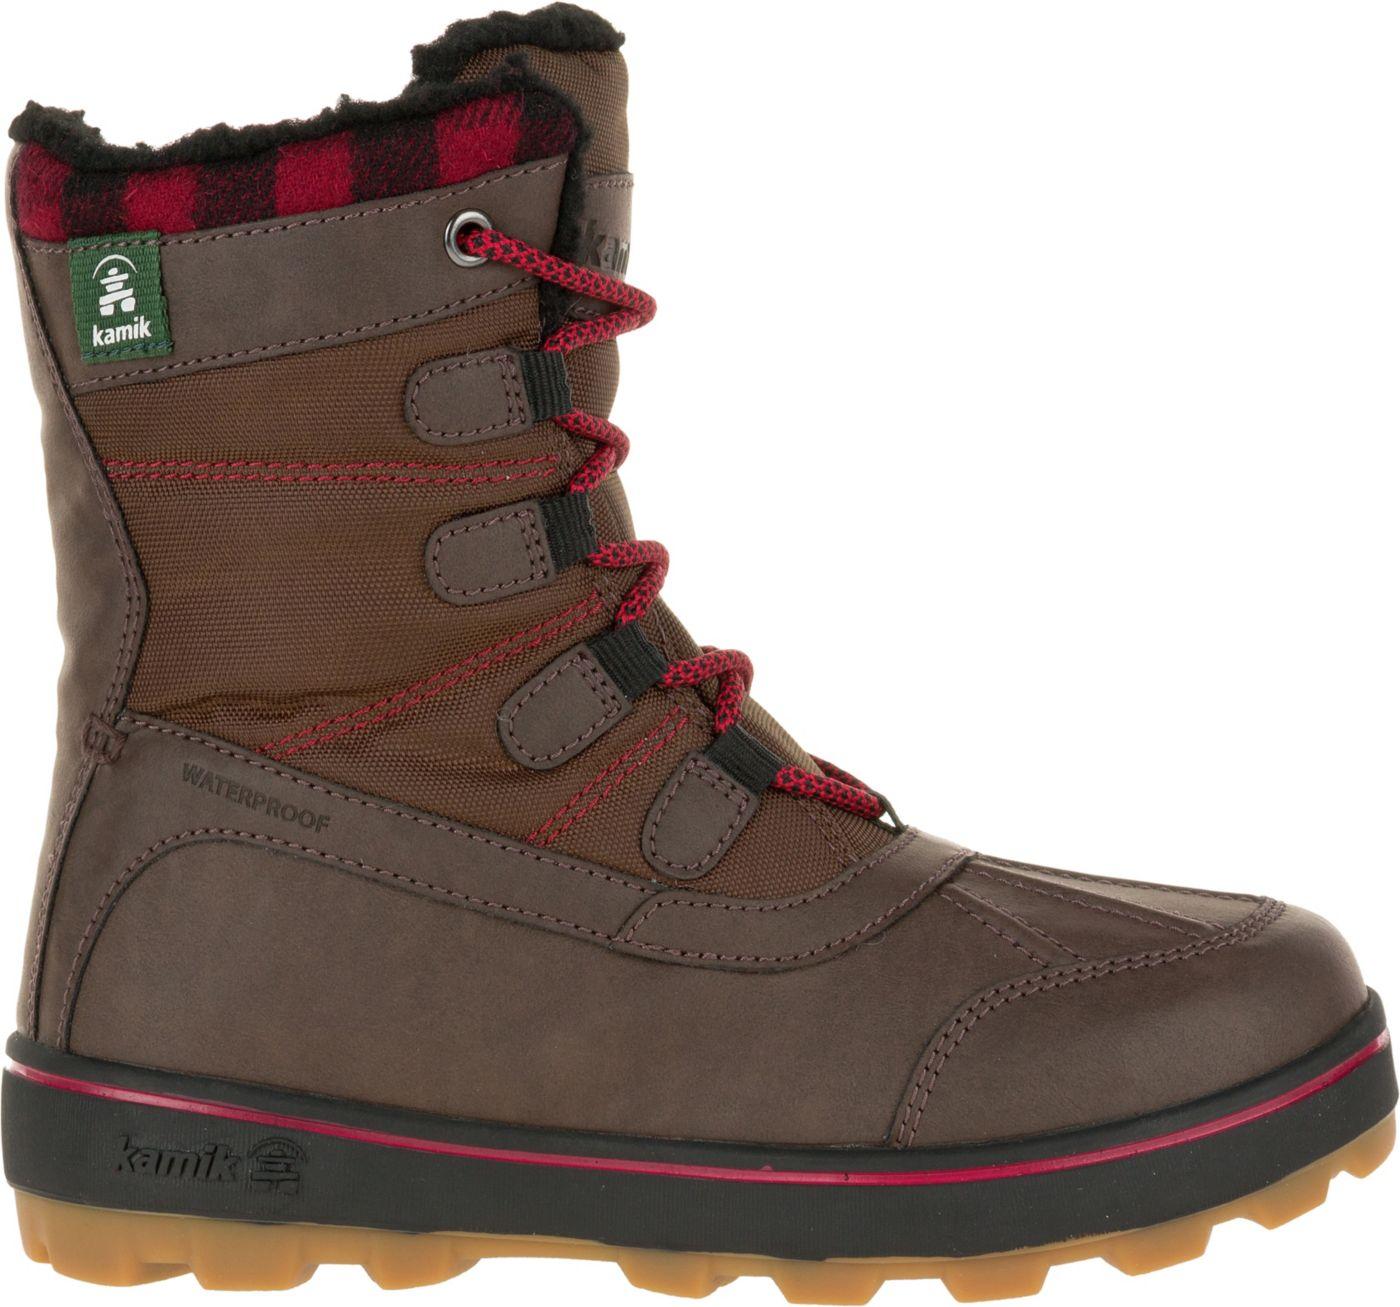 Kamik Kids' Sesame 200g Waterproof Winter Boots